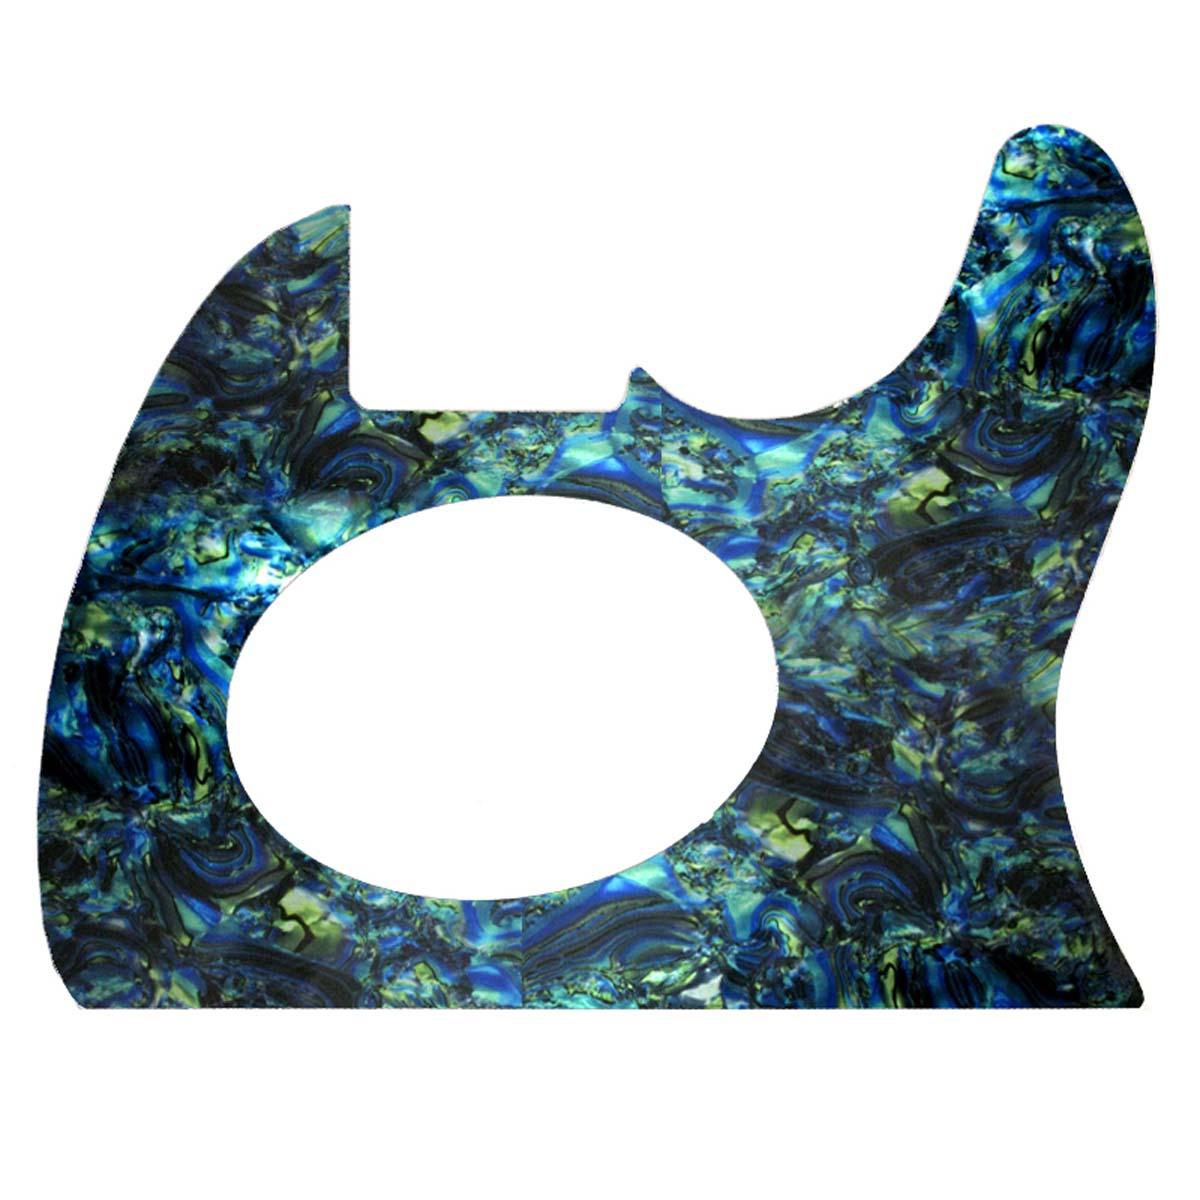 Telecoustic Style Acoustic Pickguard - Faux Blue Abalone - CUSTOM ORDER